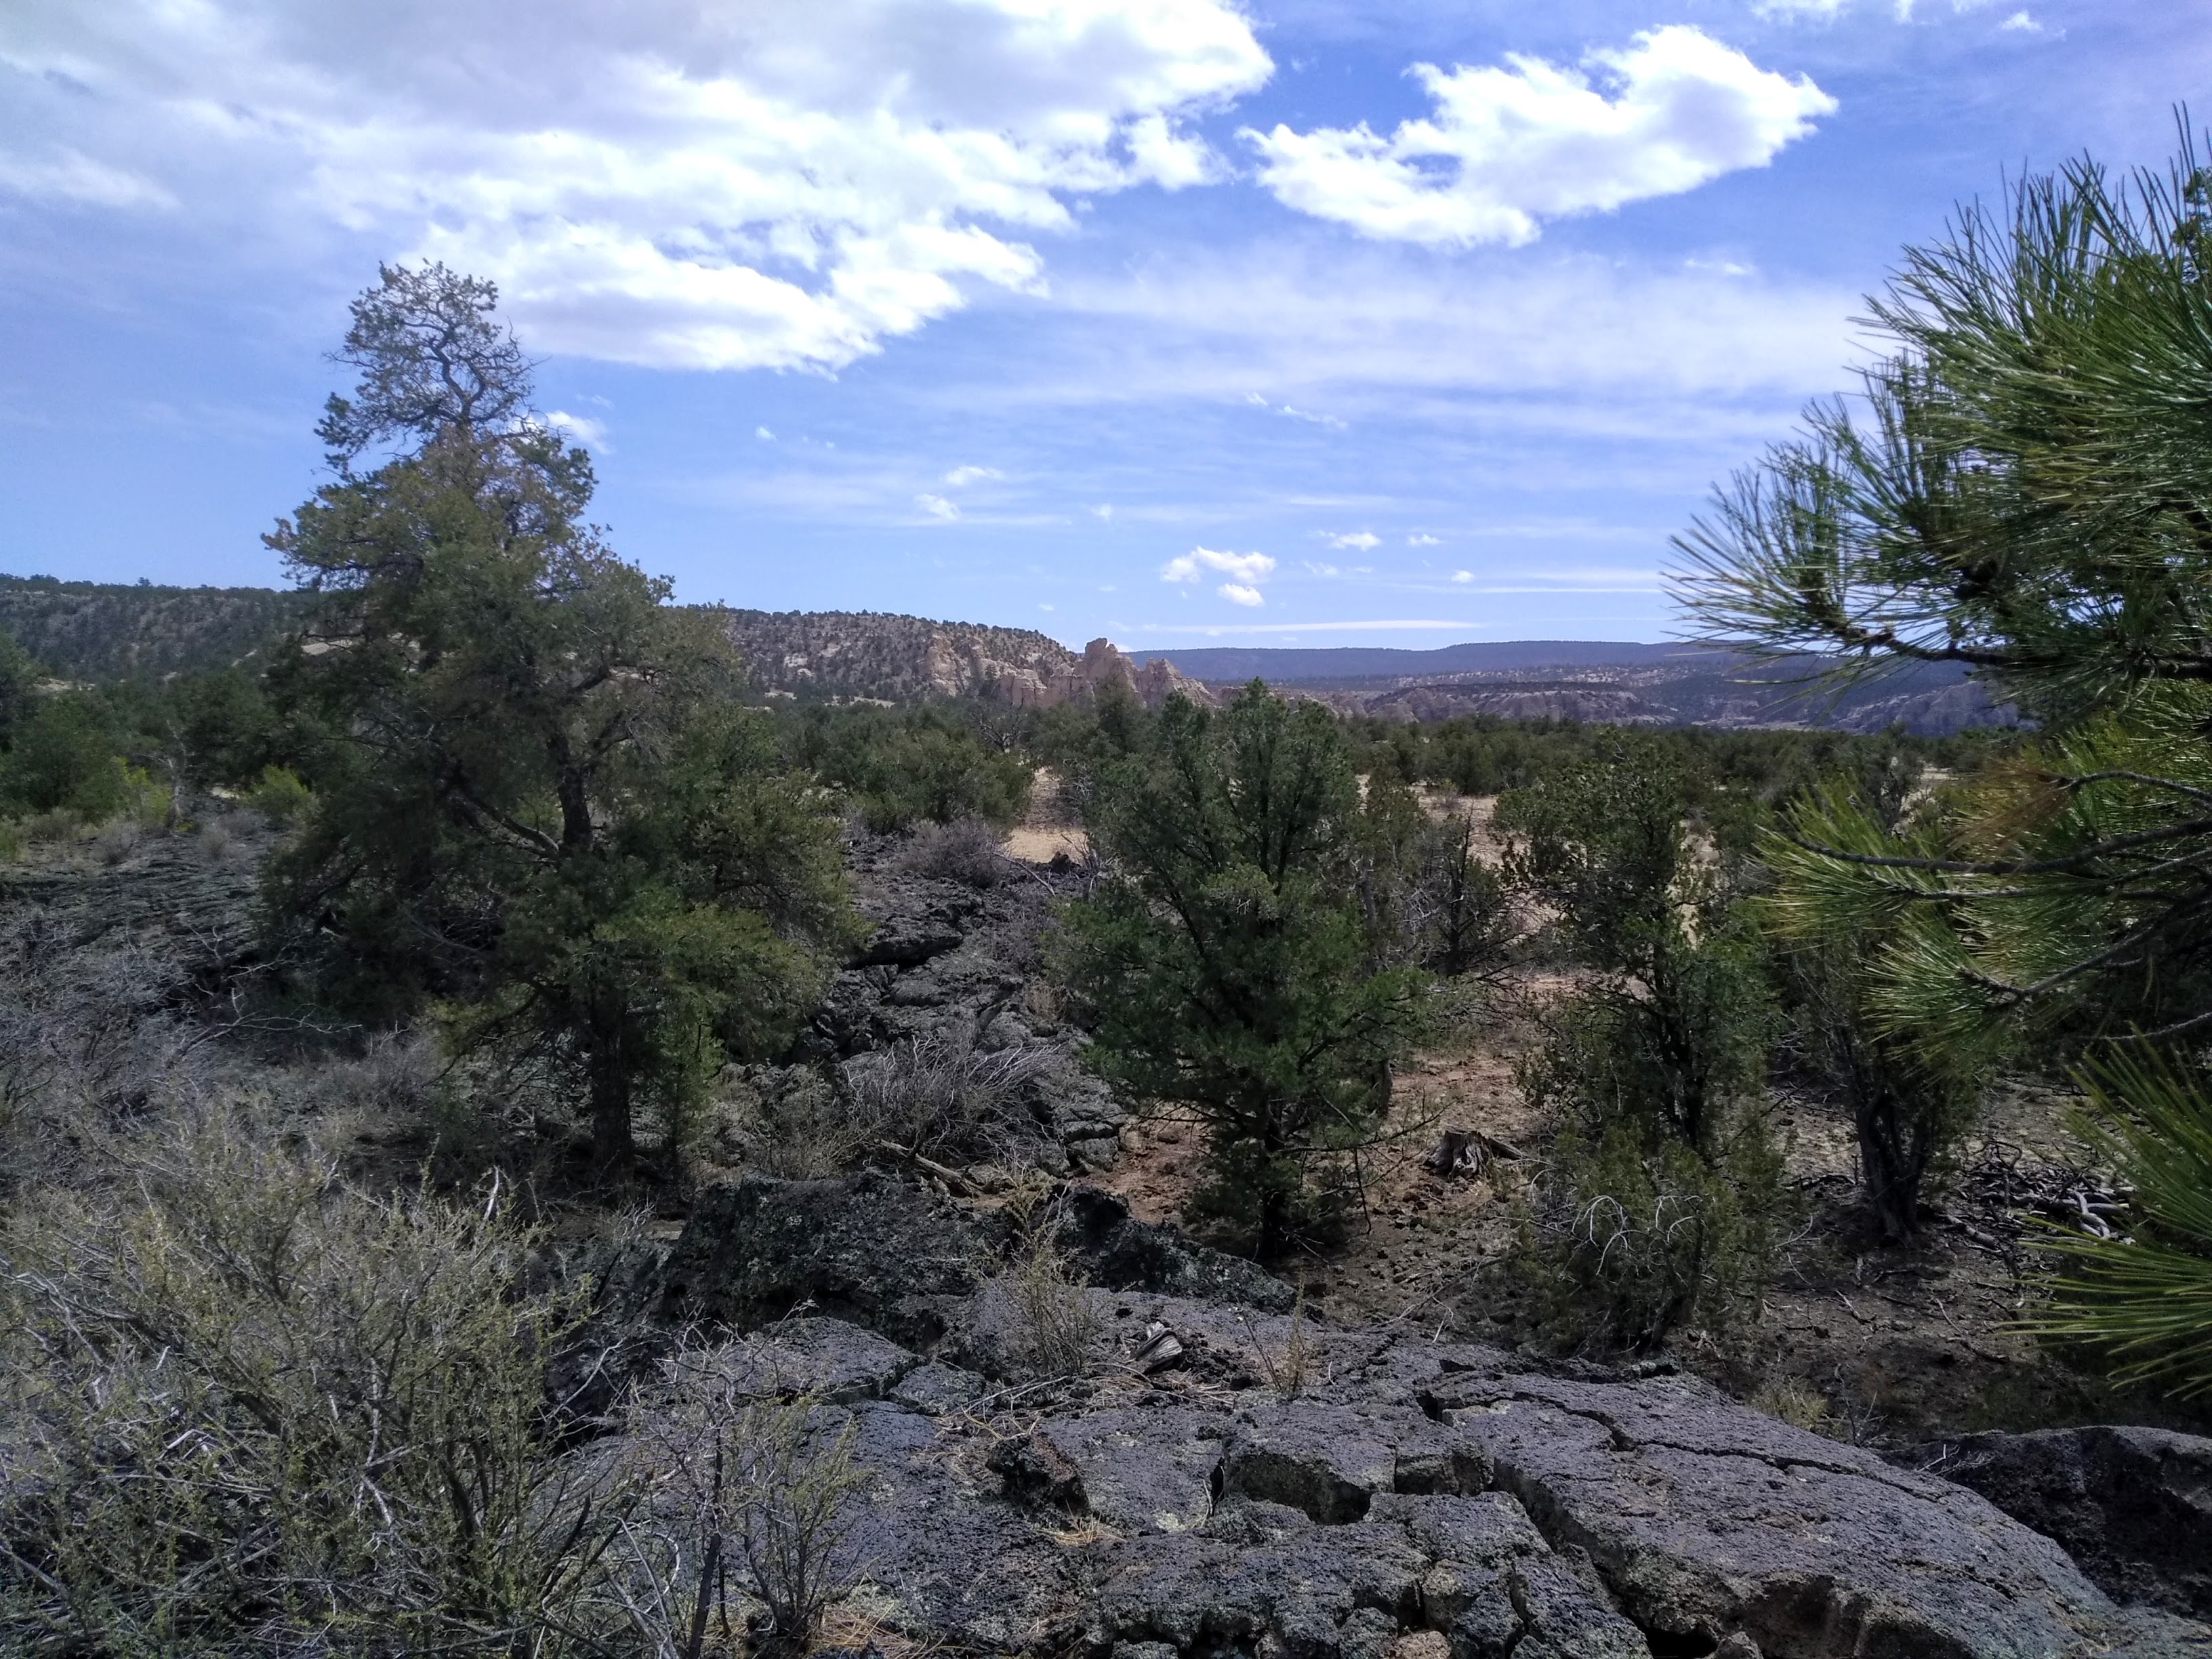 Hiking on Los Caballos